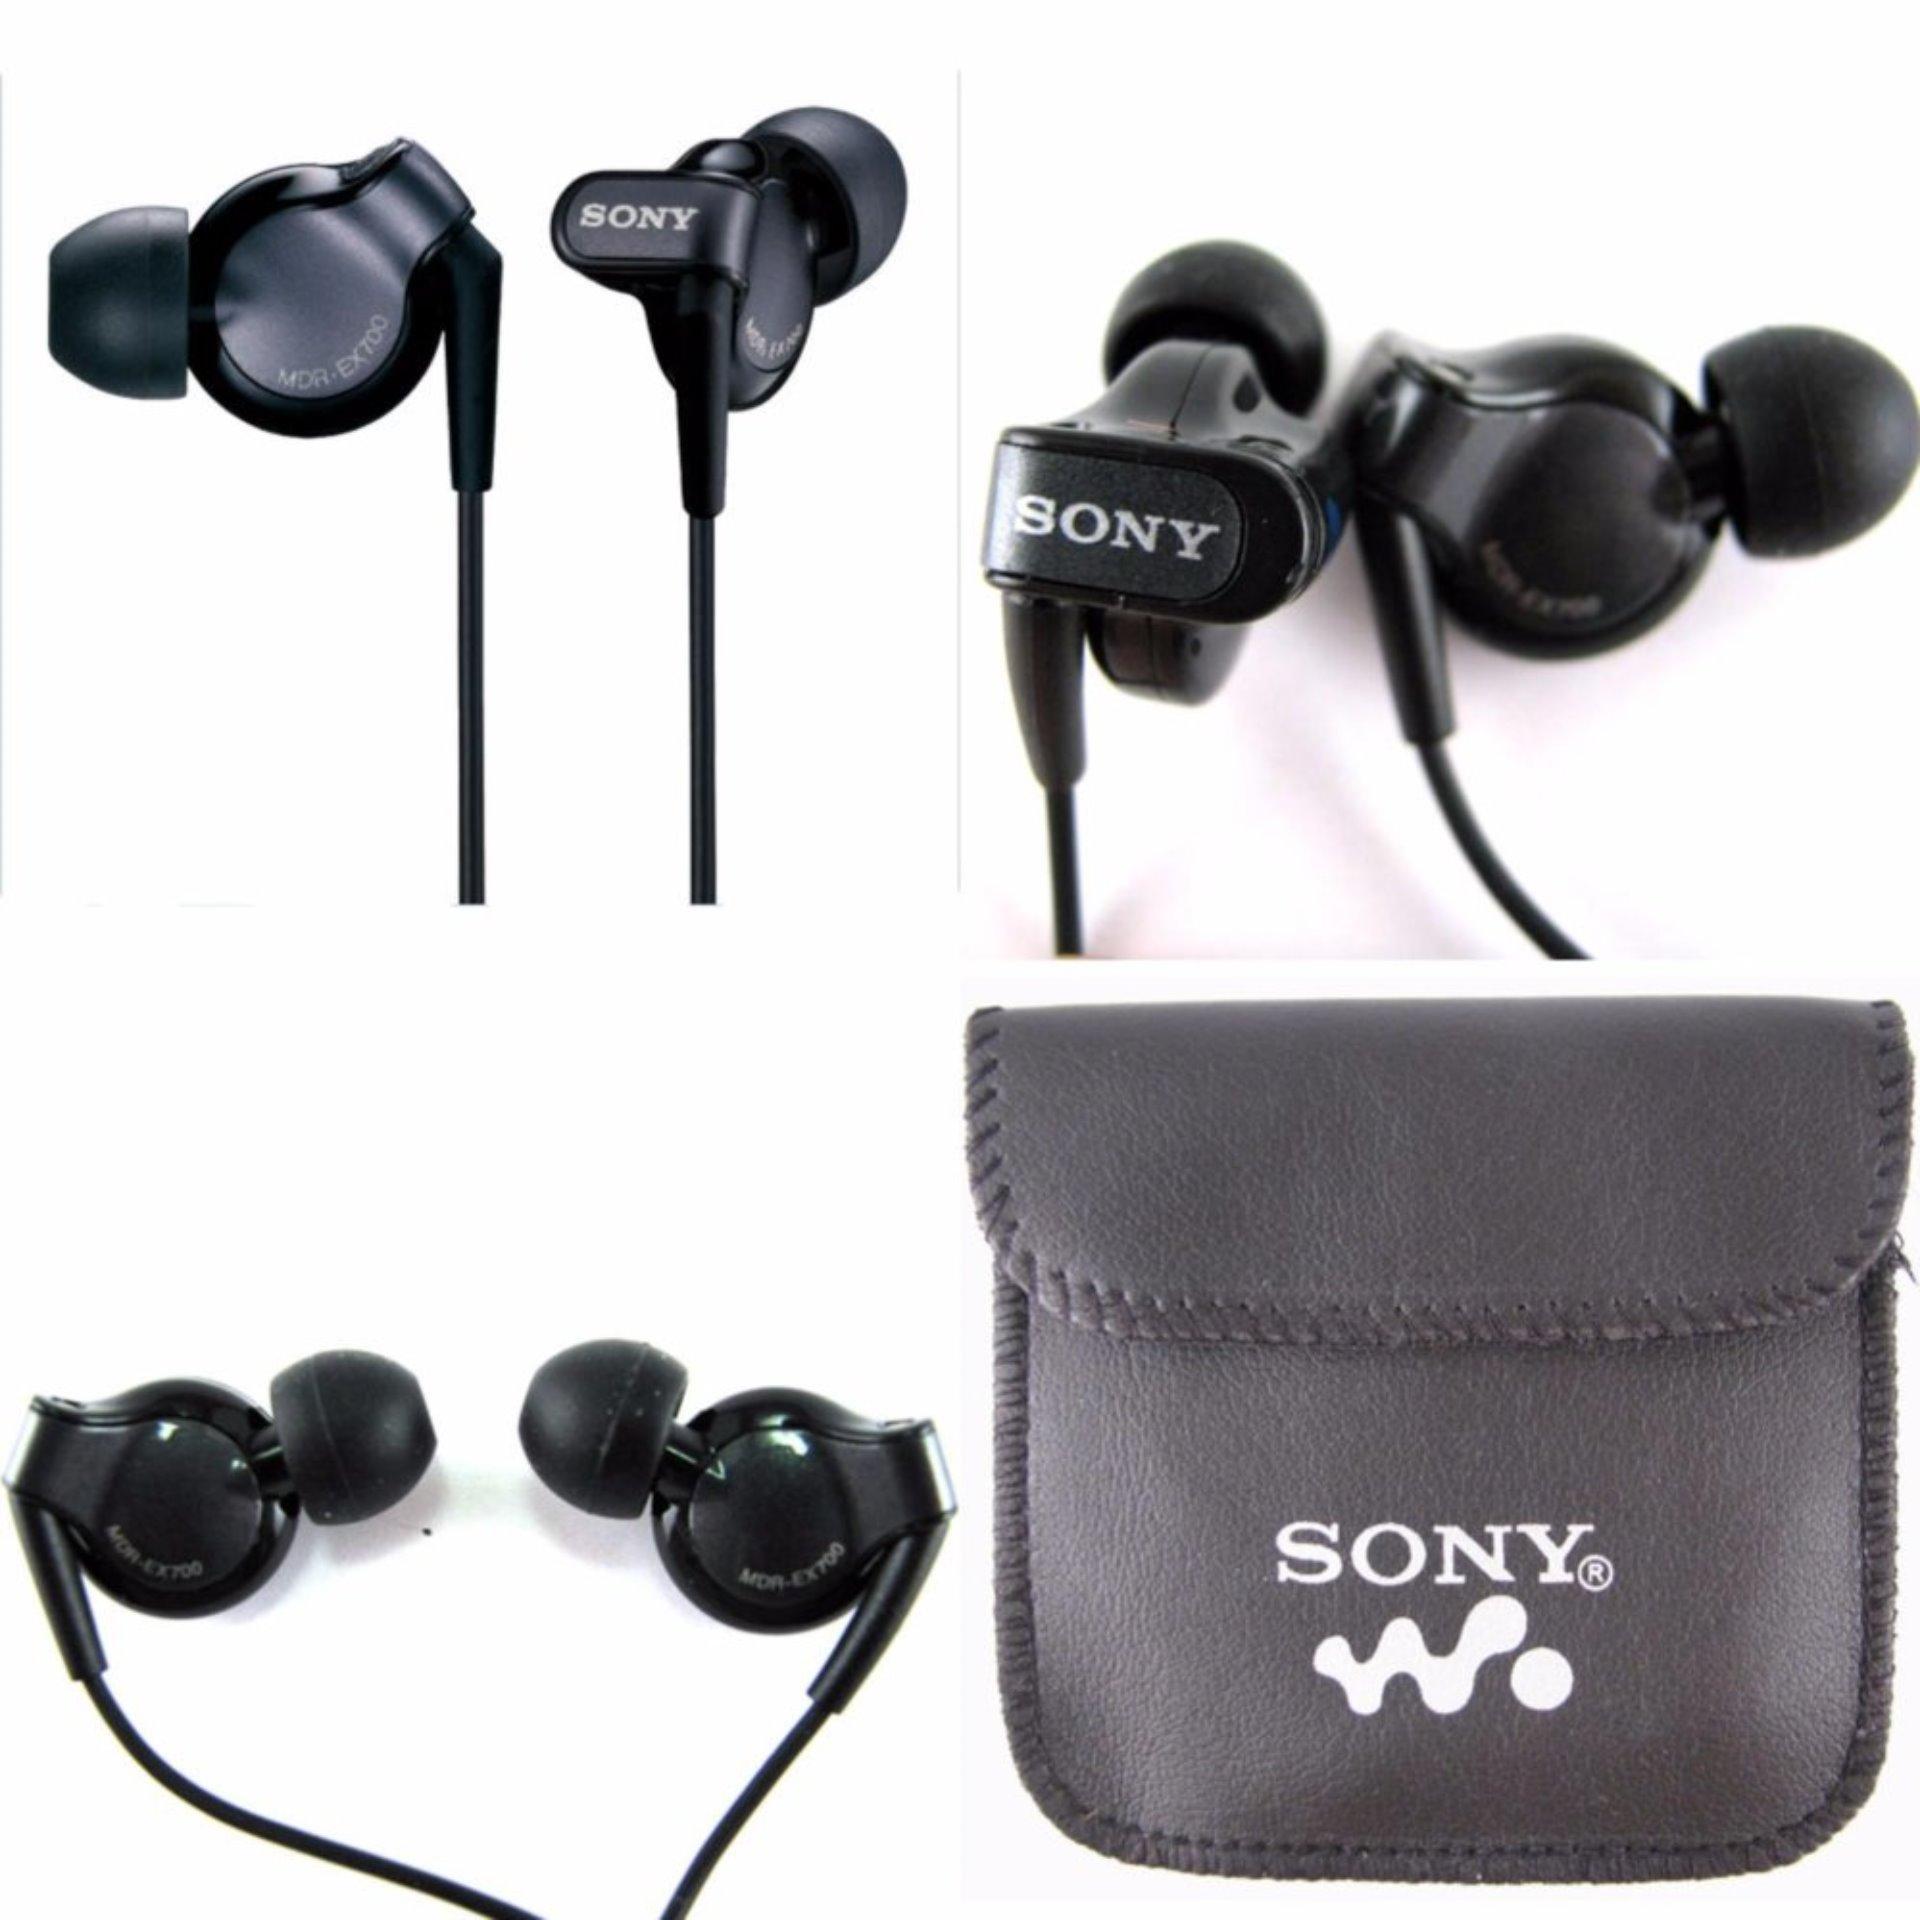 Harga Penawaran Earphones Headset Handsfree Sony Walkman Mdr Ex700 Hansfree Super Bass Original